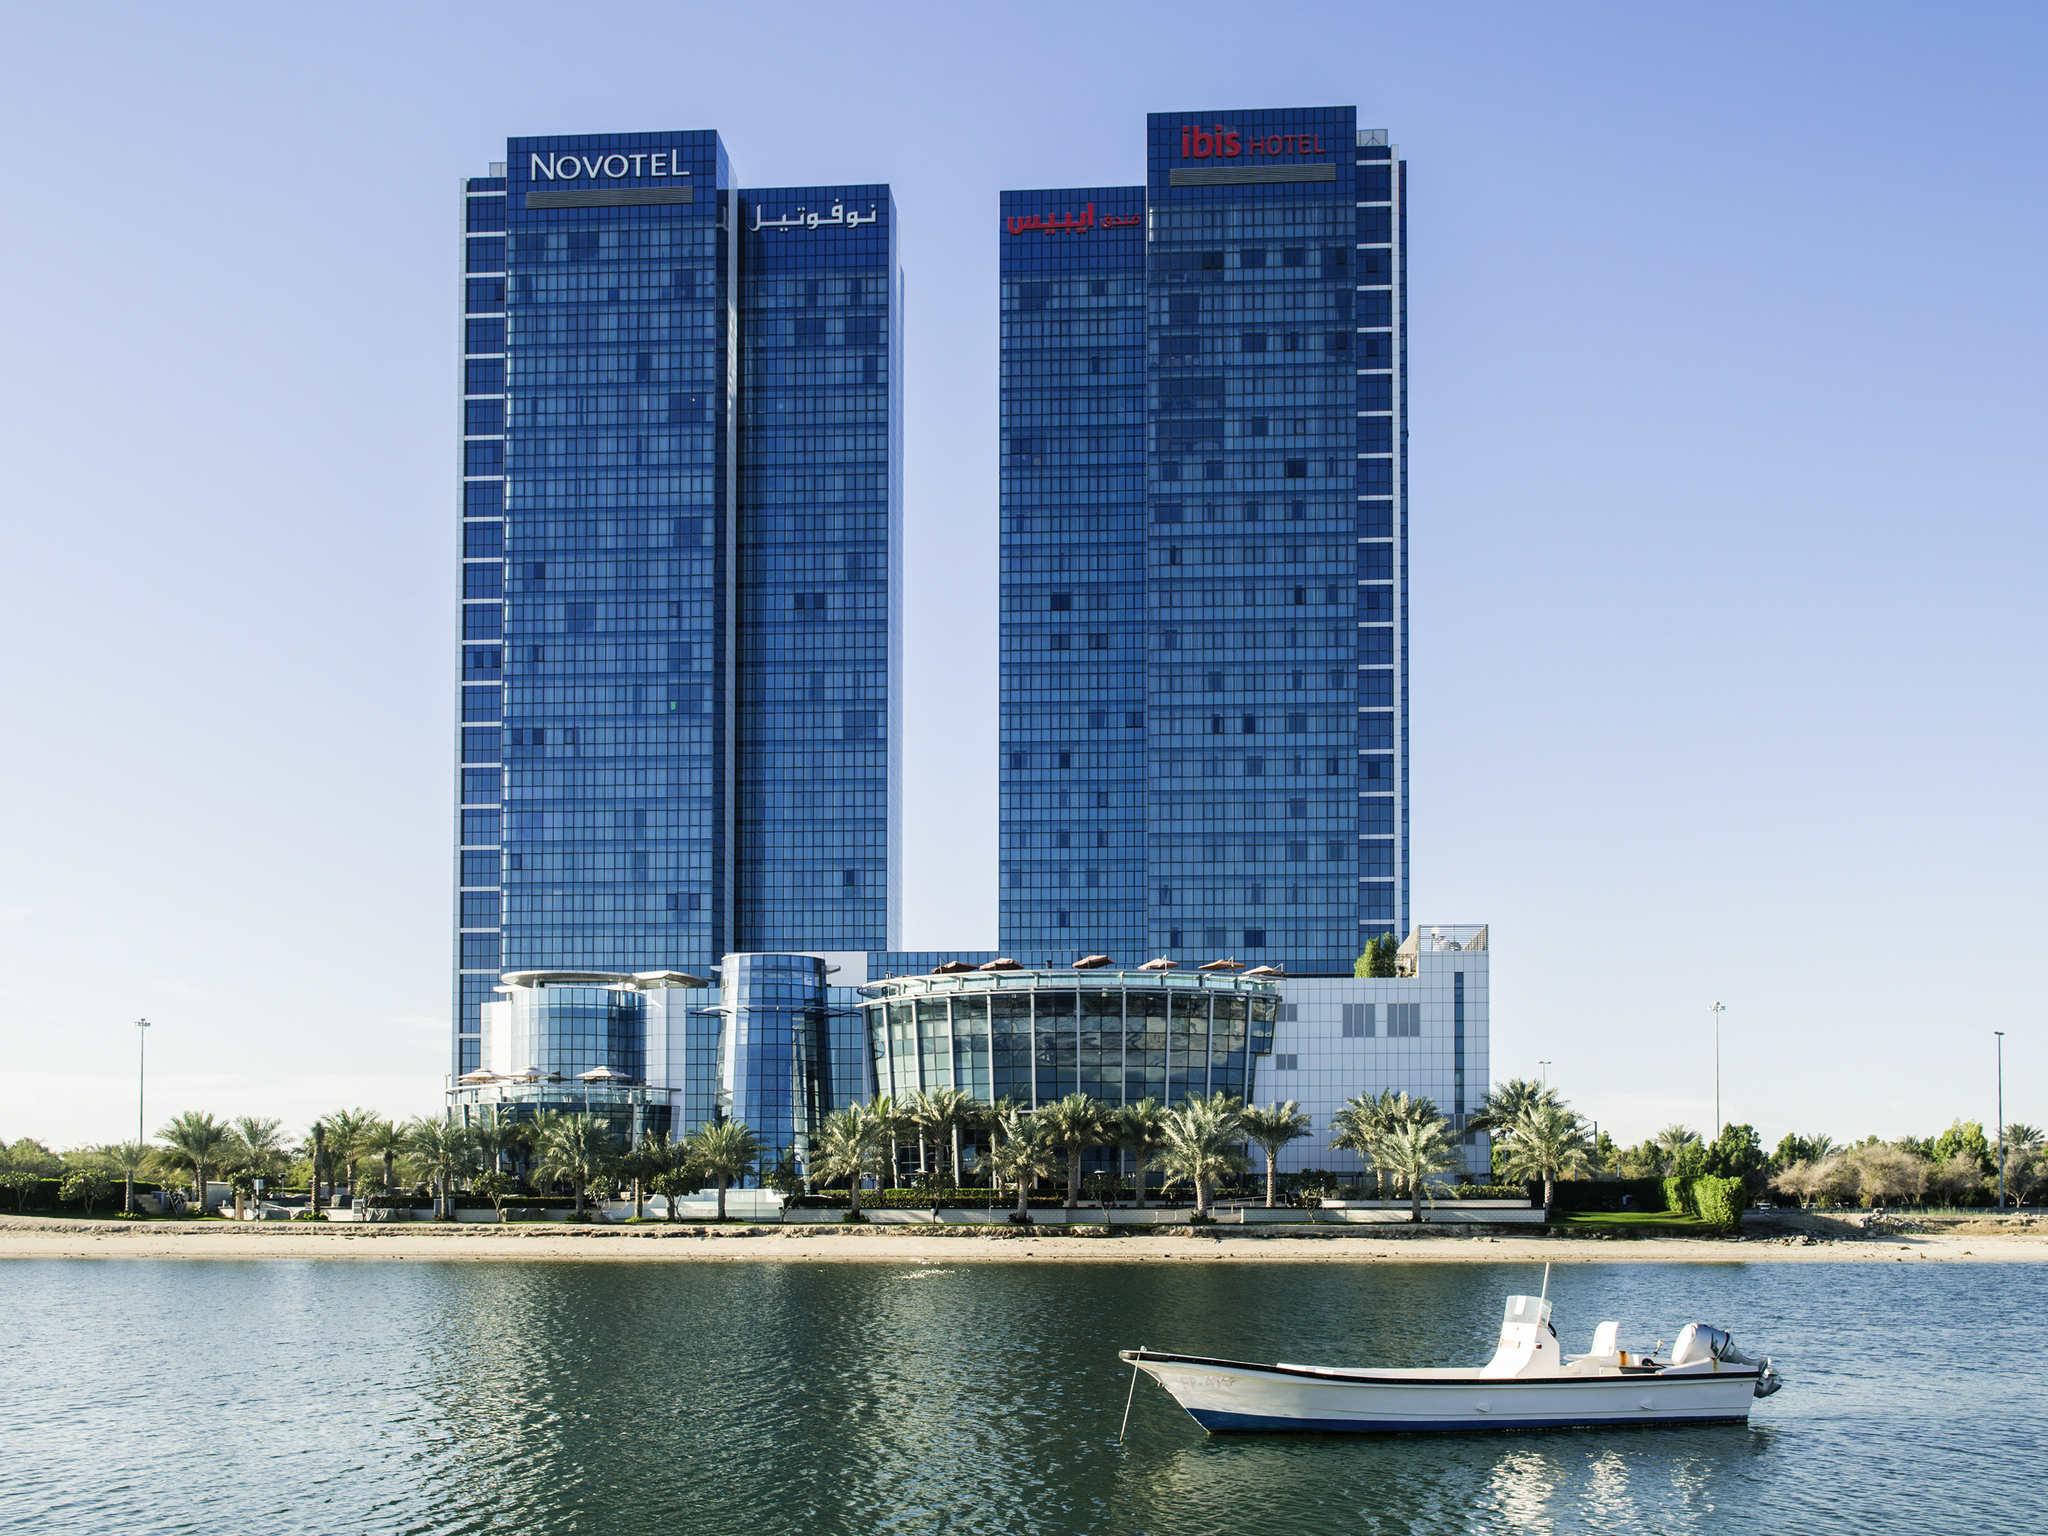 فندق - نوفوتيل Novotel أبو ظبي غايت